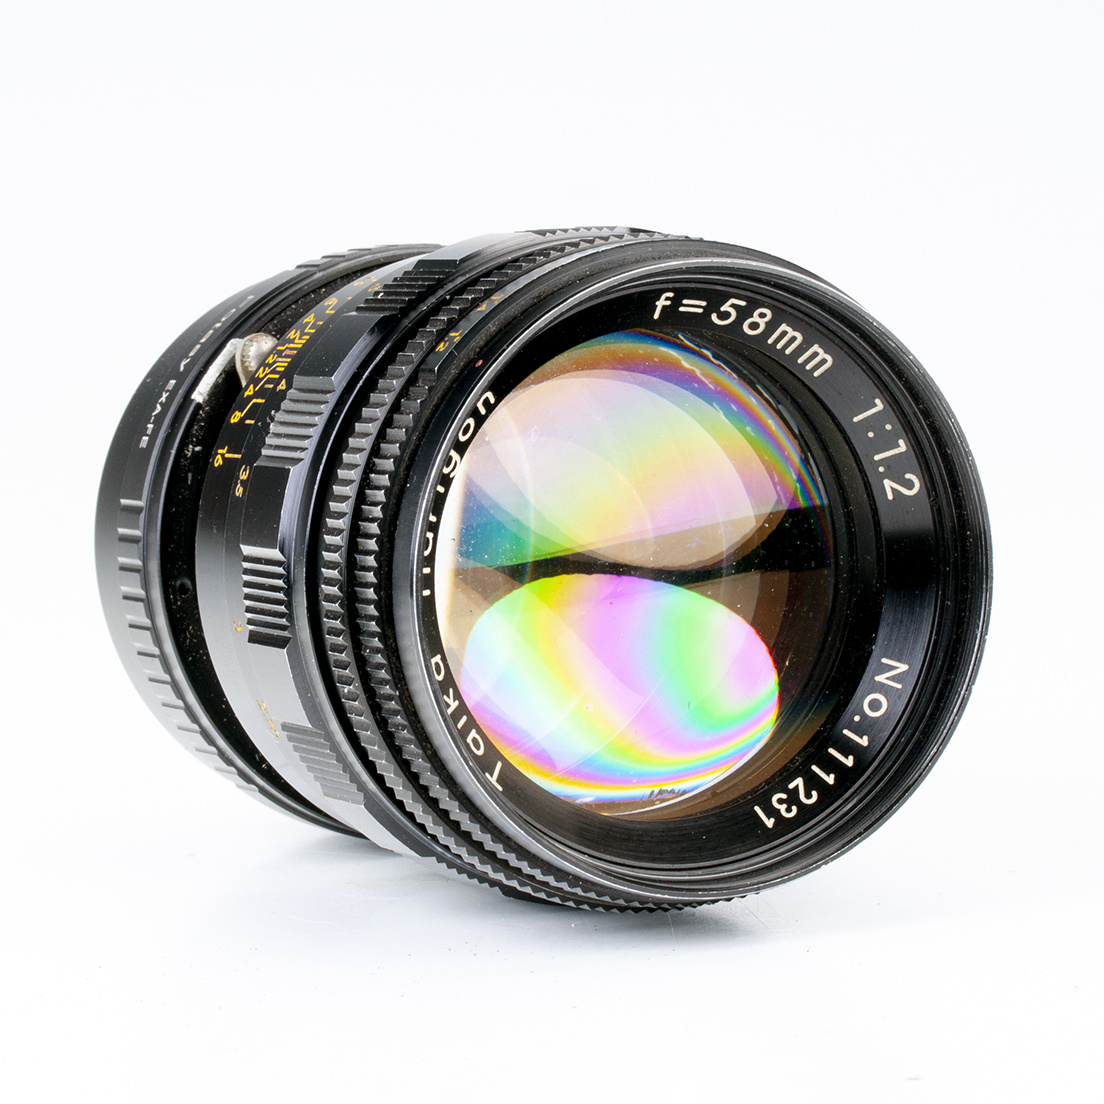 Taika Harigon 58mm f/1.2